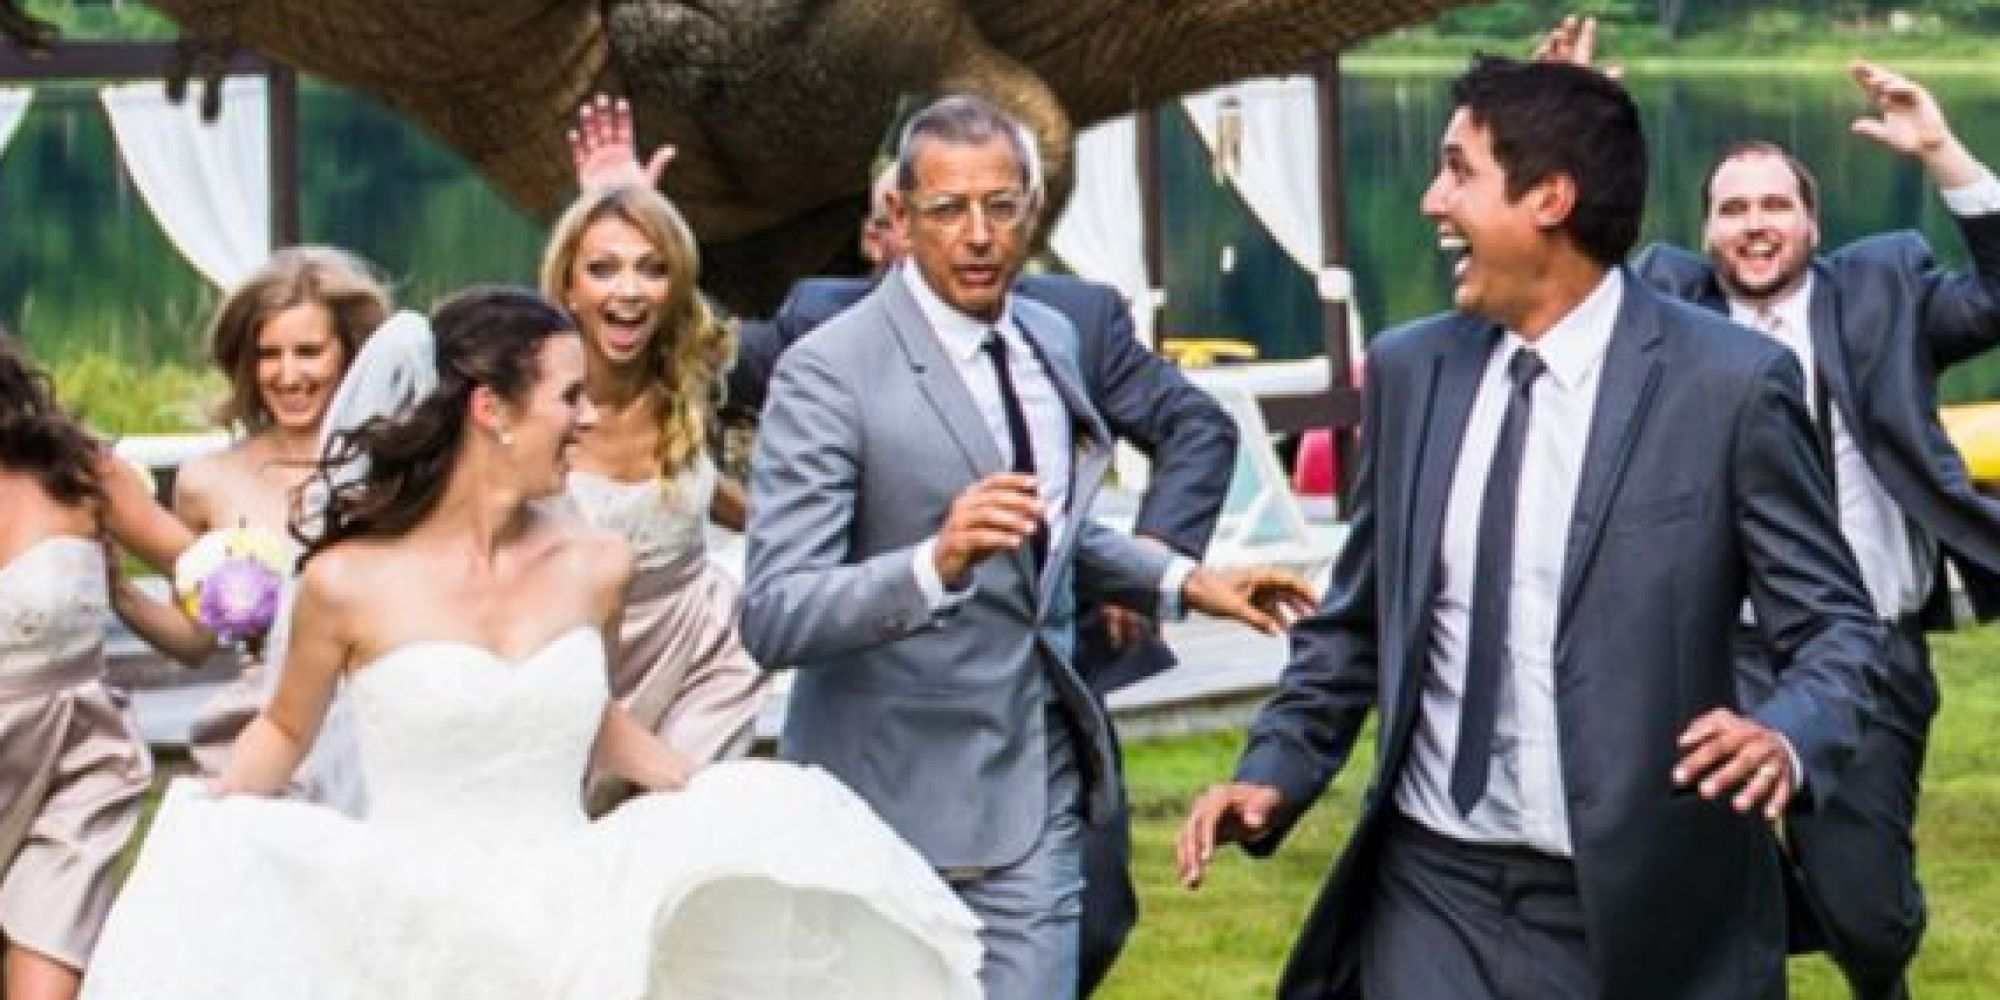 Bsl wedding